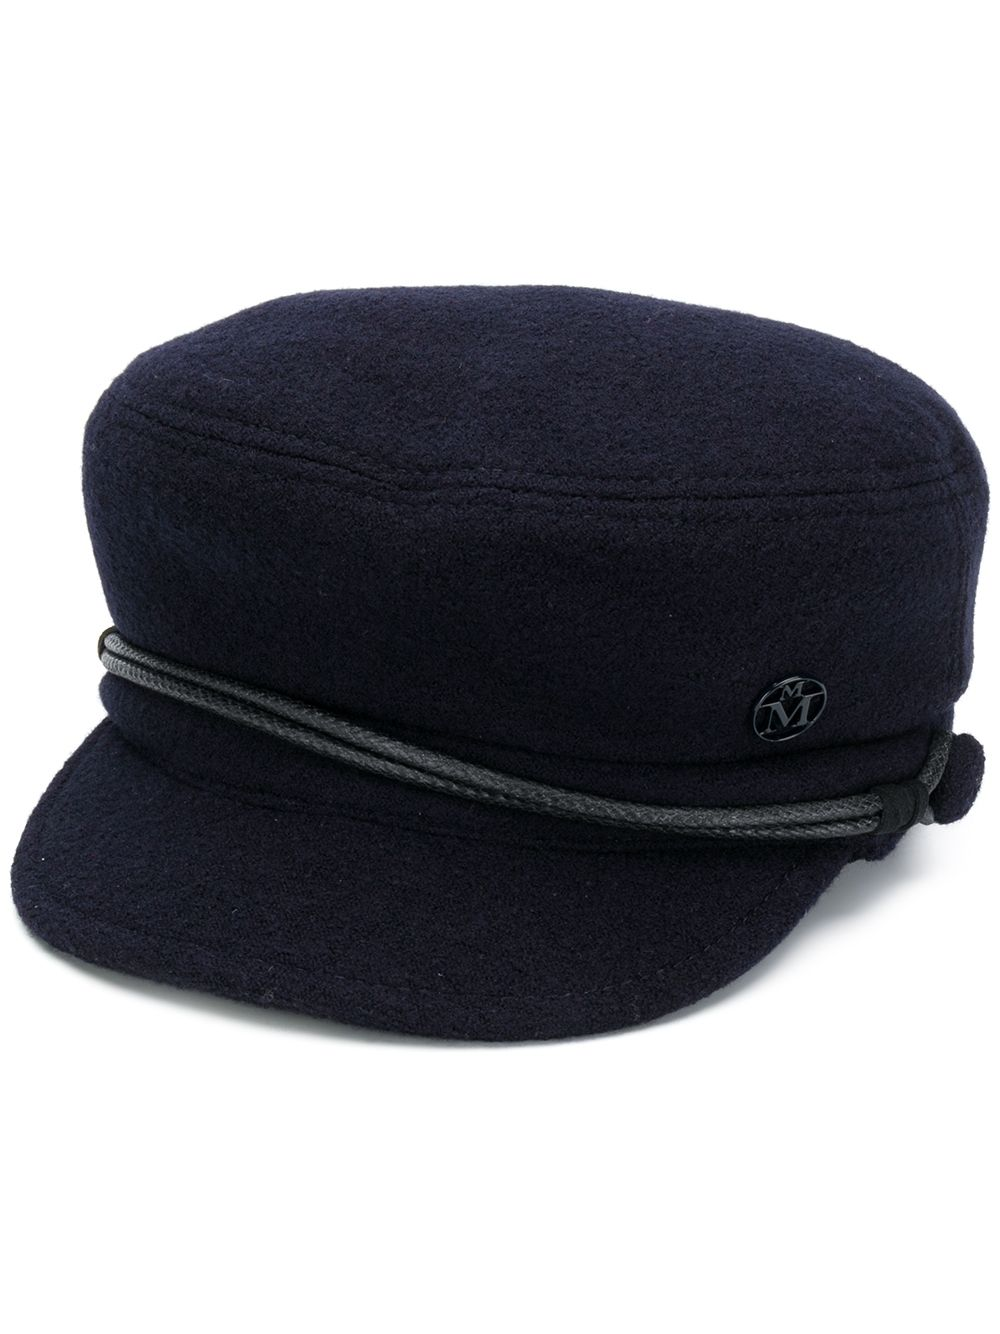 New Abby Hat